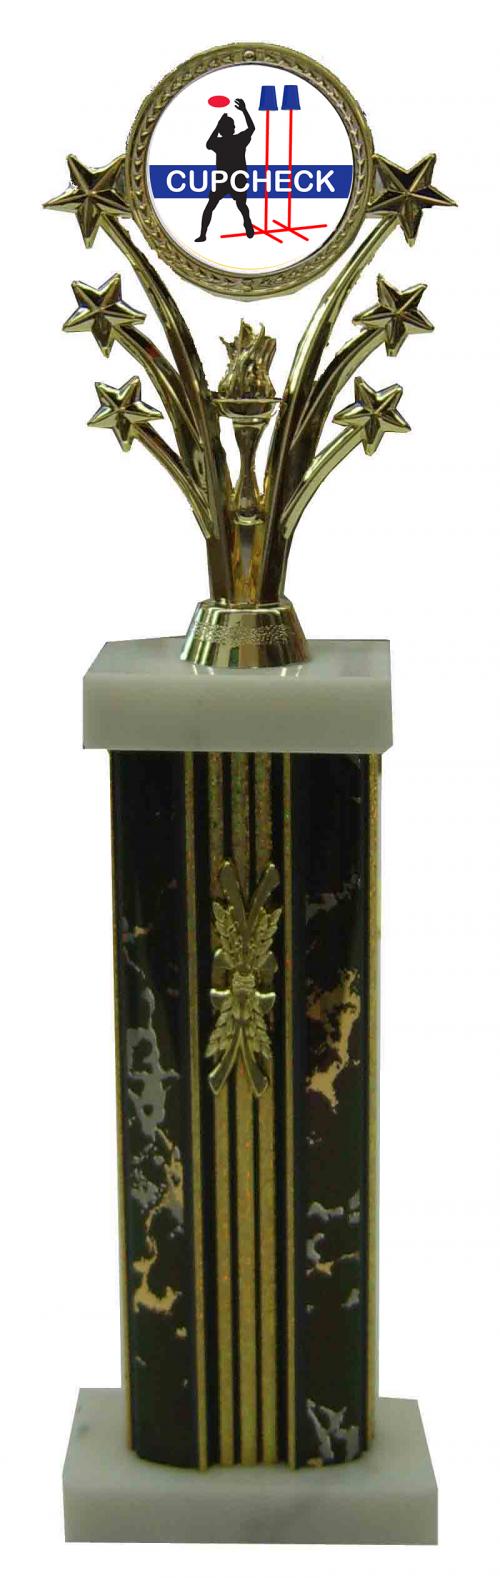 Cupcheck Column Trophy